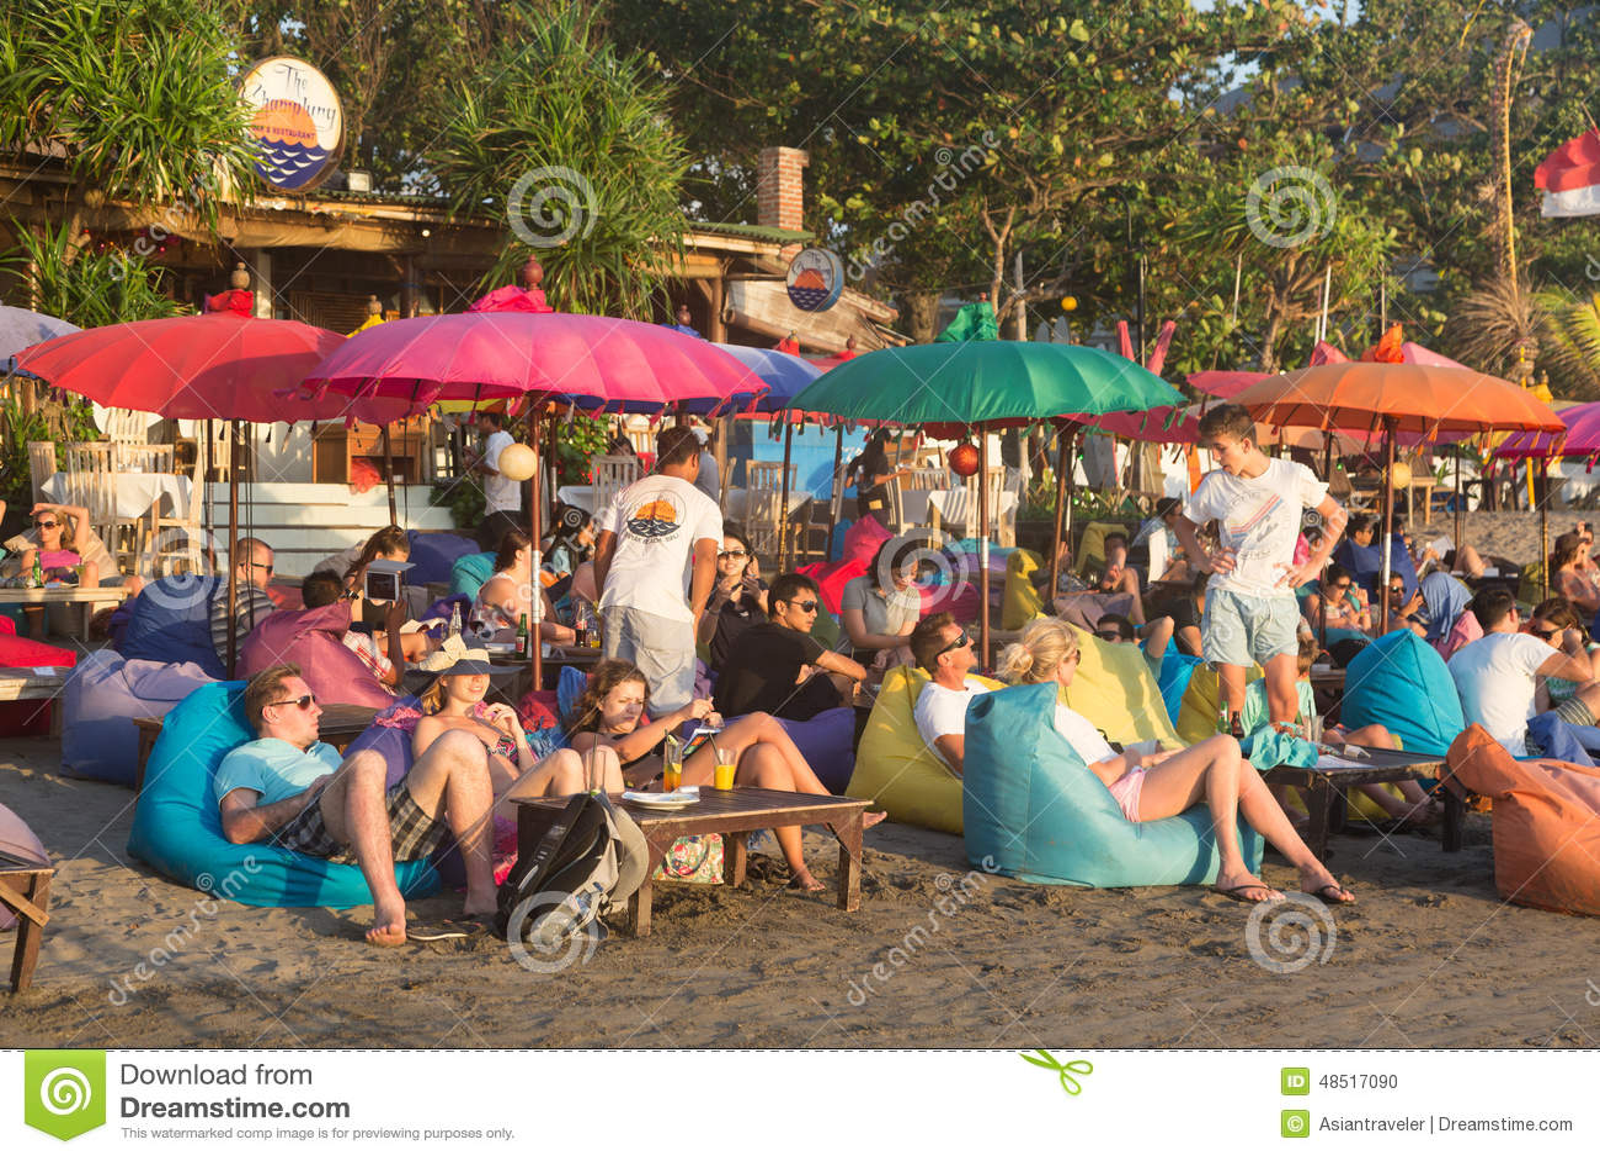 Bali beach bar editorial image. Image of indonesia ...